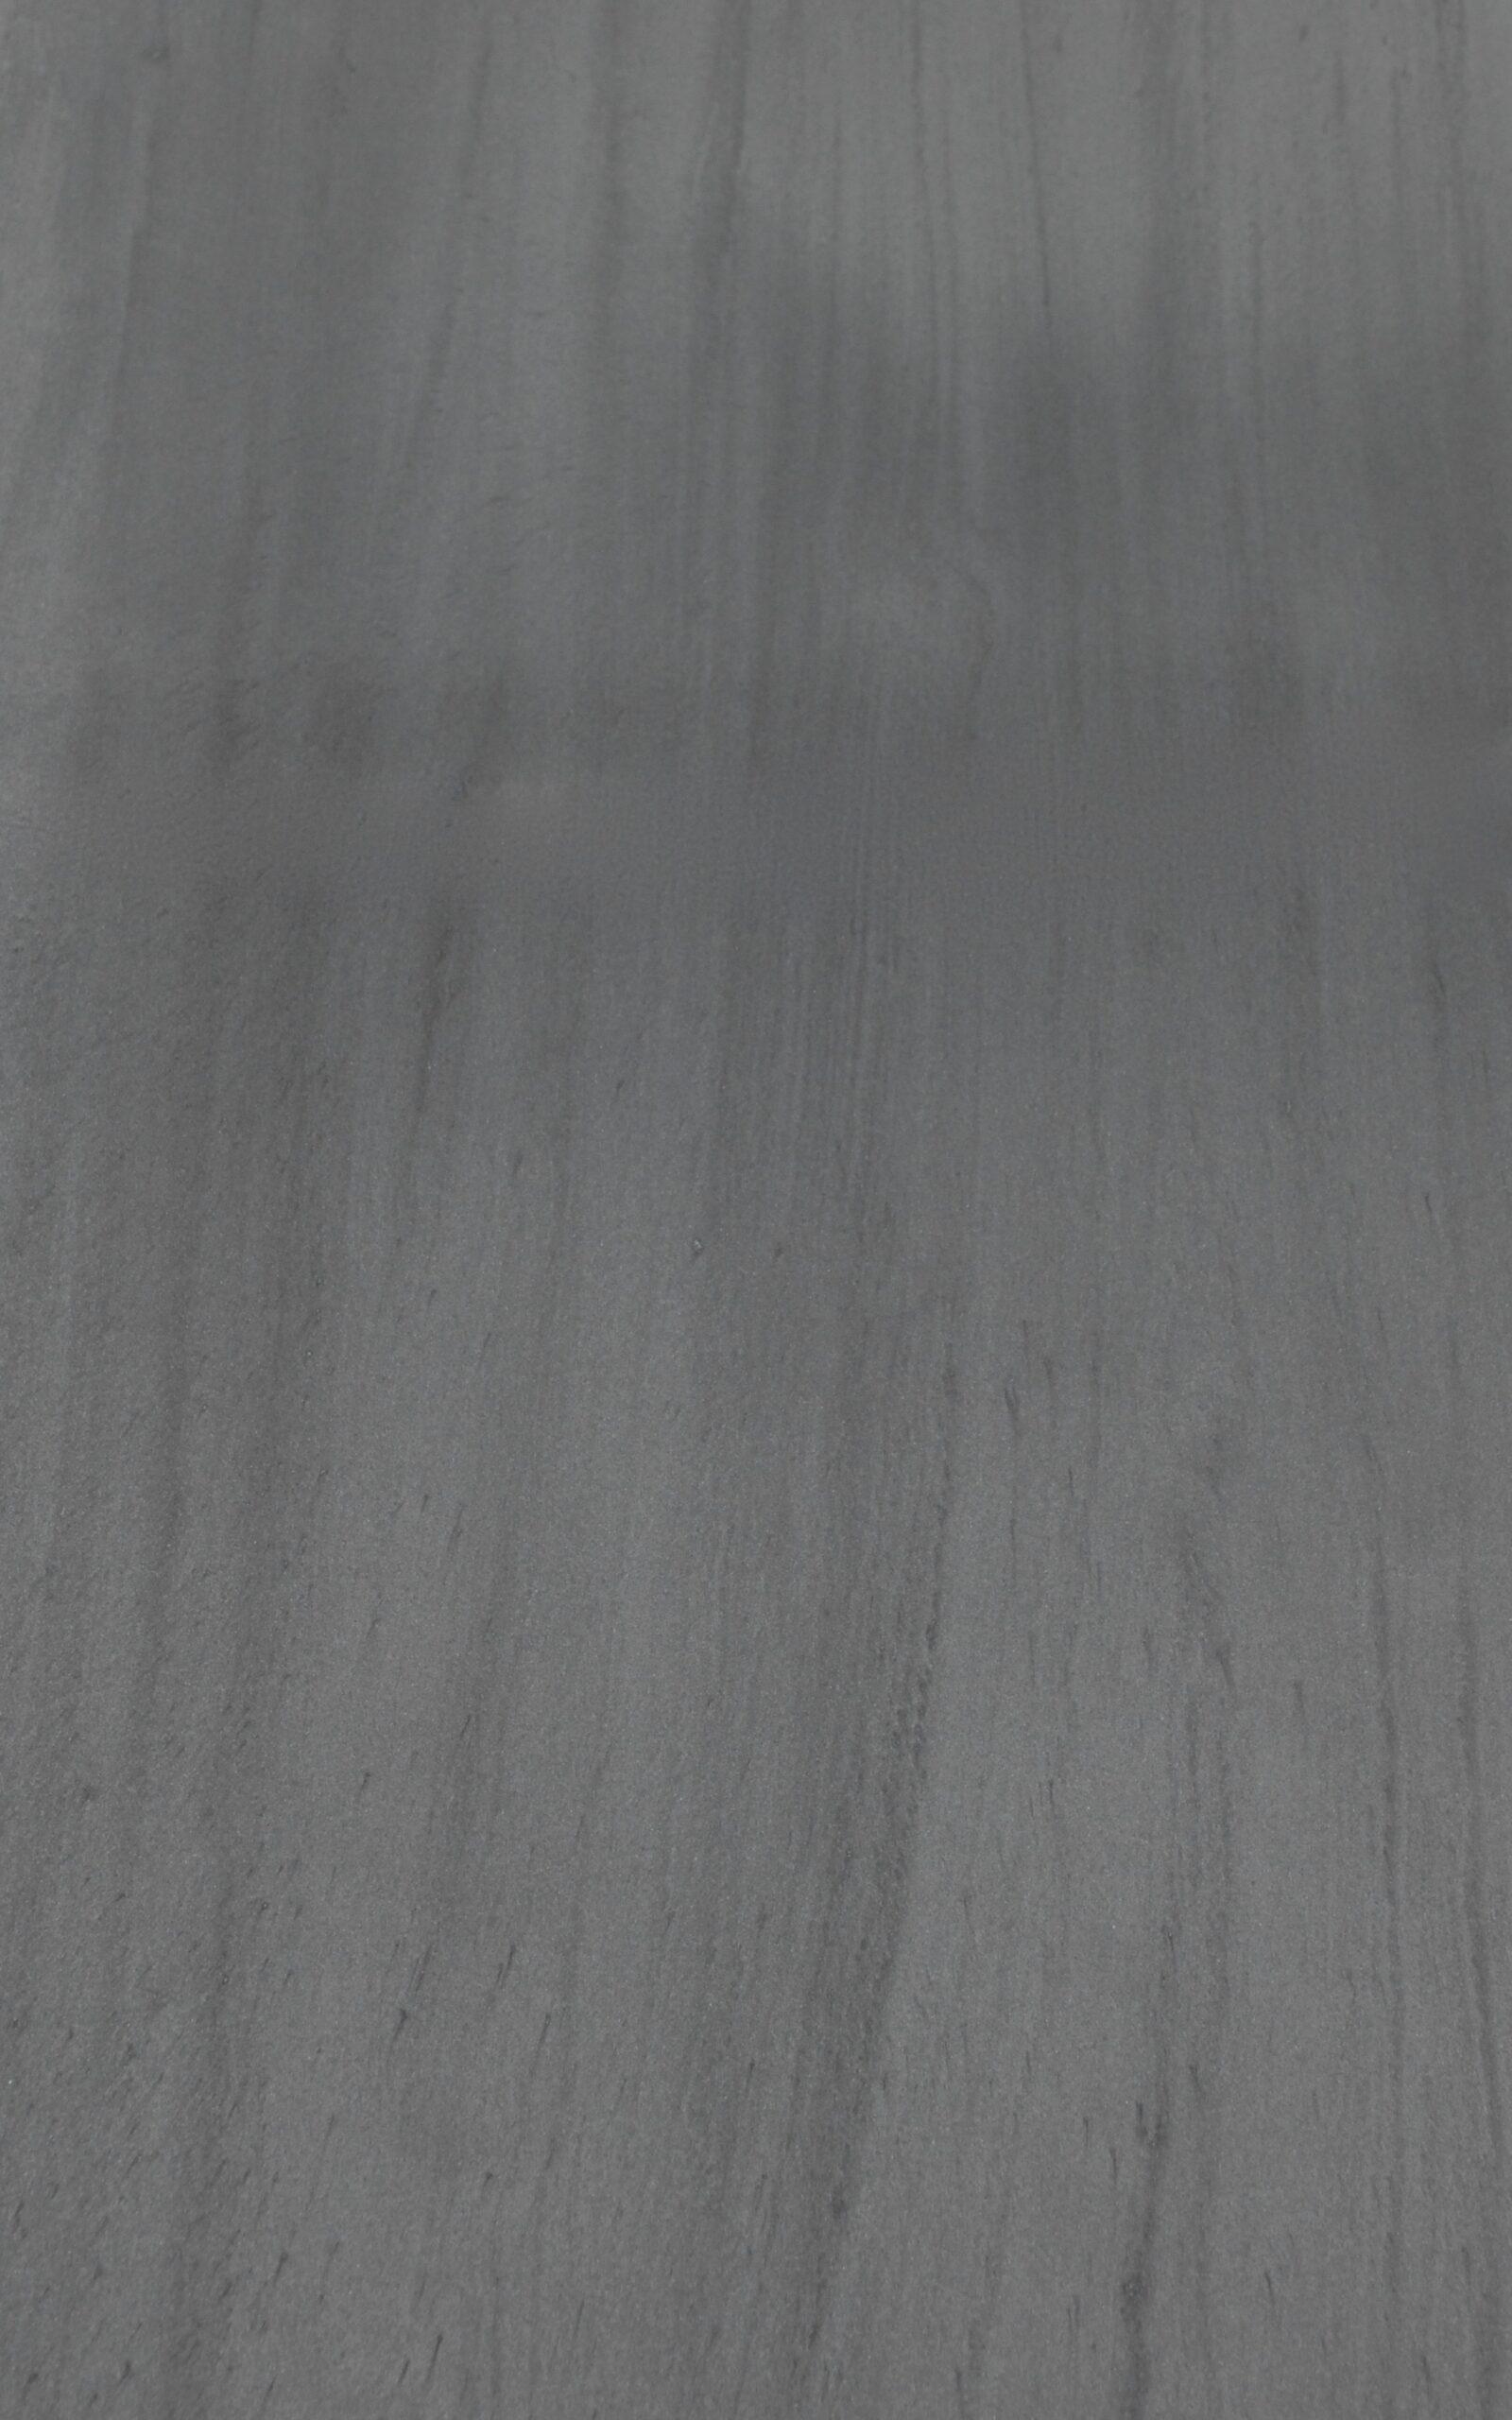 Silver Grey metallic epoxy